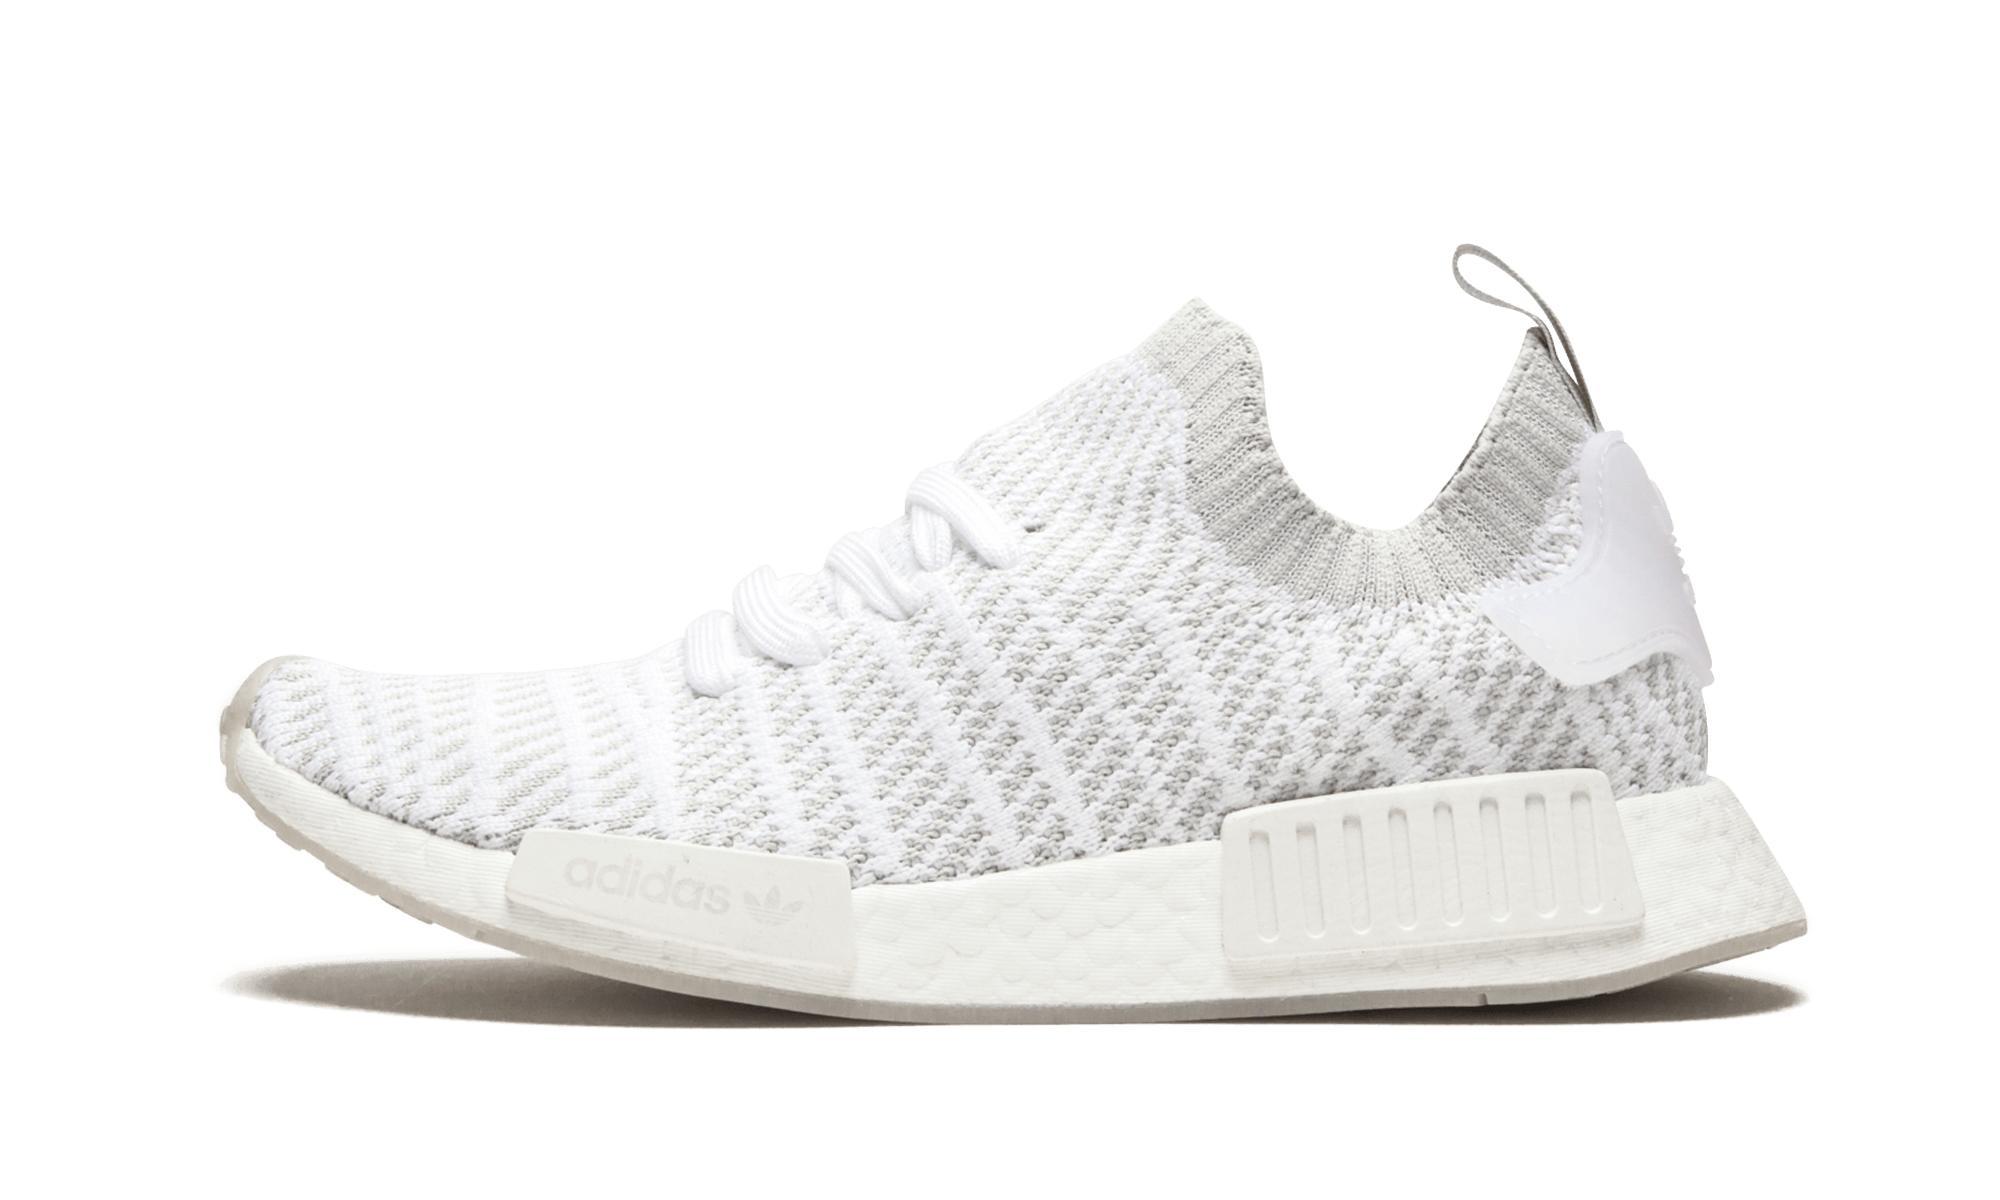 brand new 294ad 094c6 adidas. Men s White Nmd r1 Stlt Pk